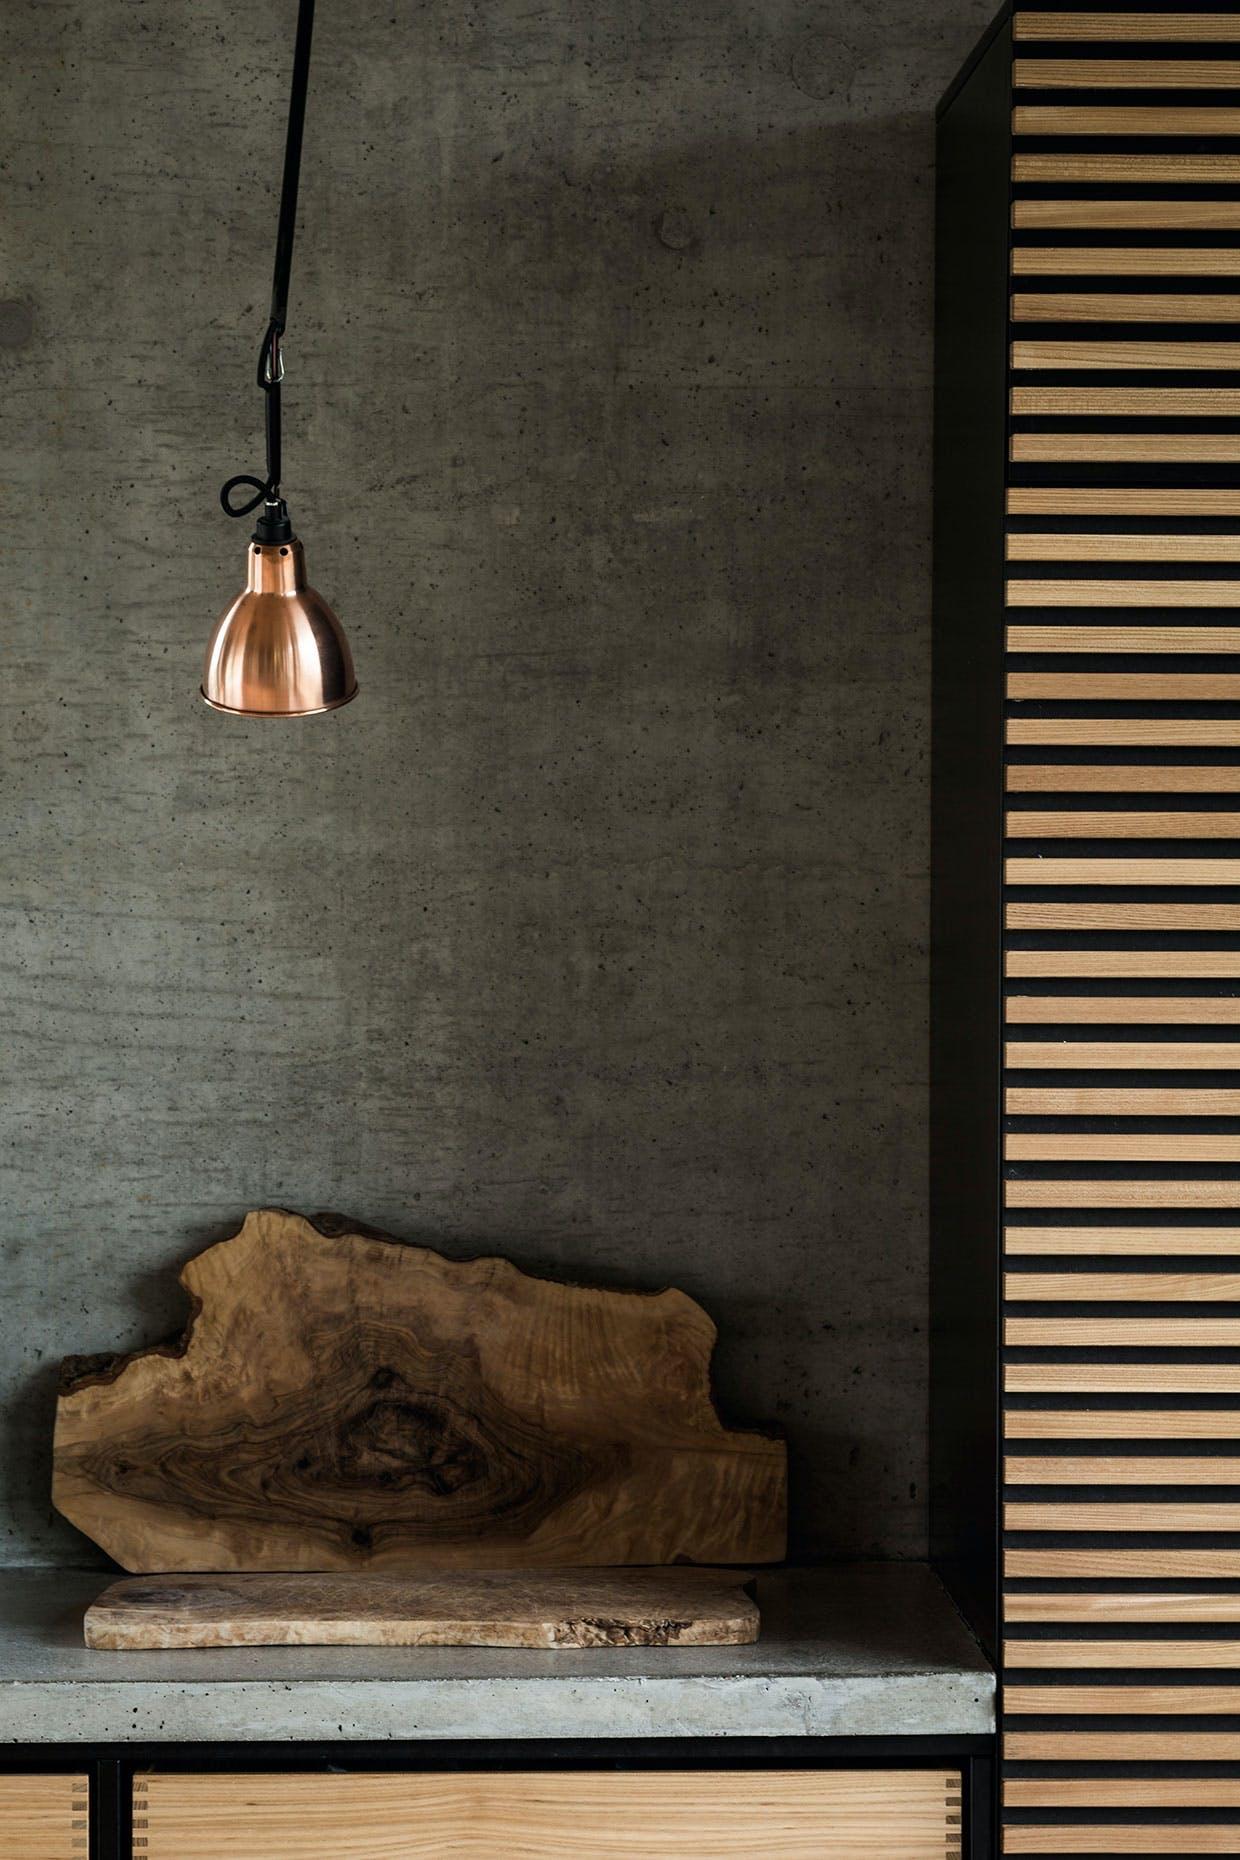 køkken beton skærebæt lampe kobber Lampe Gras